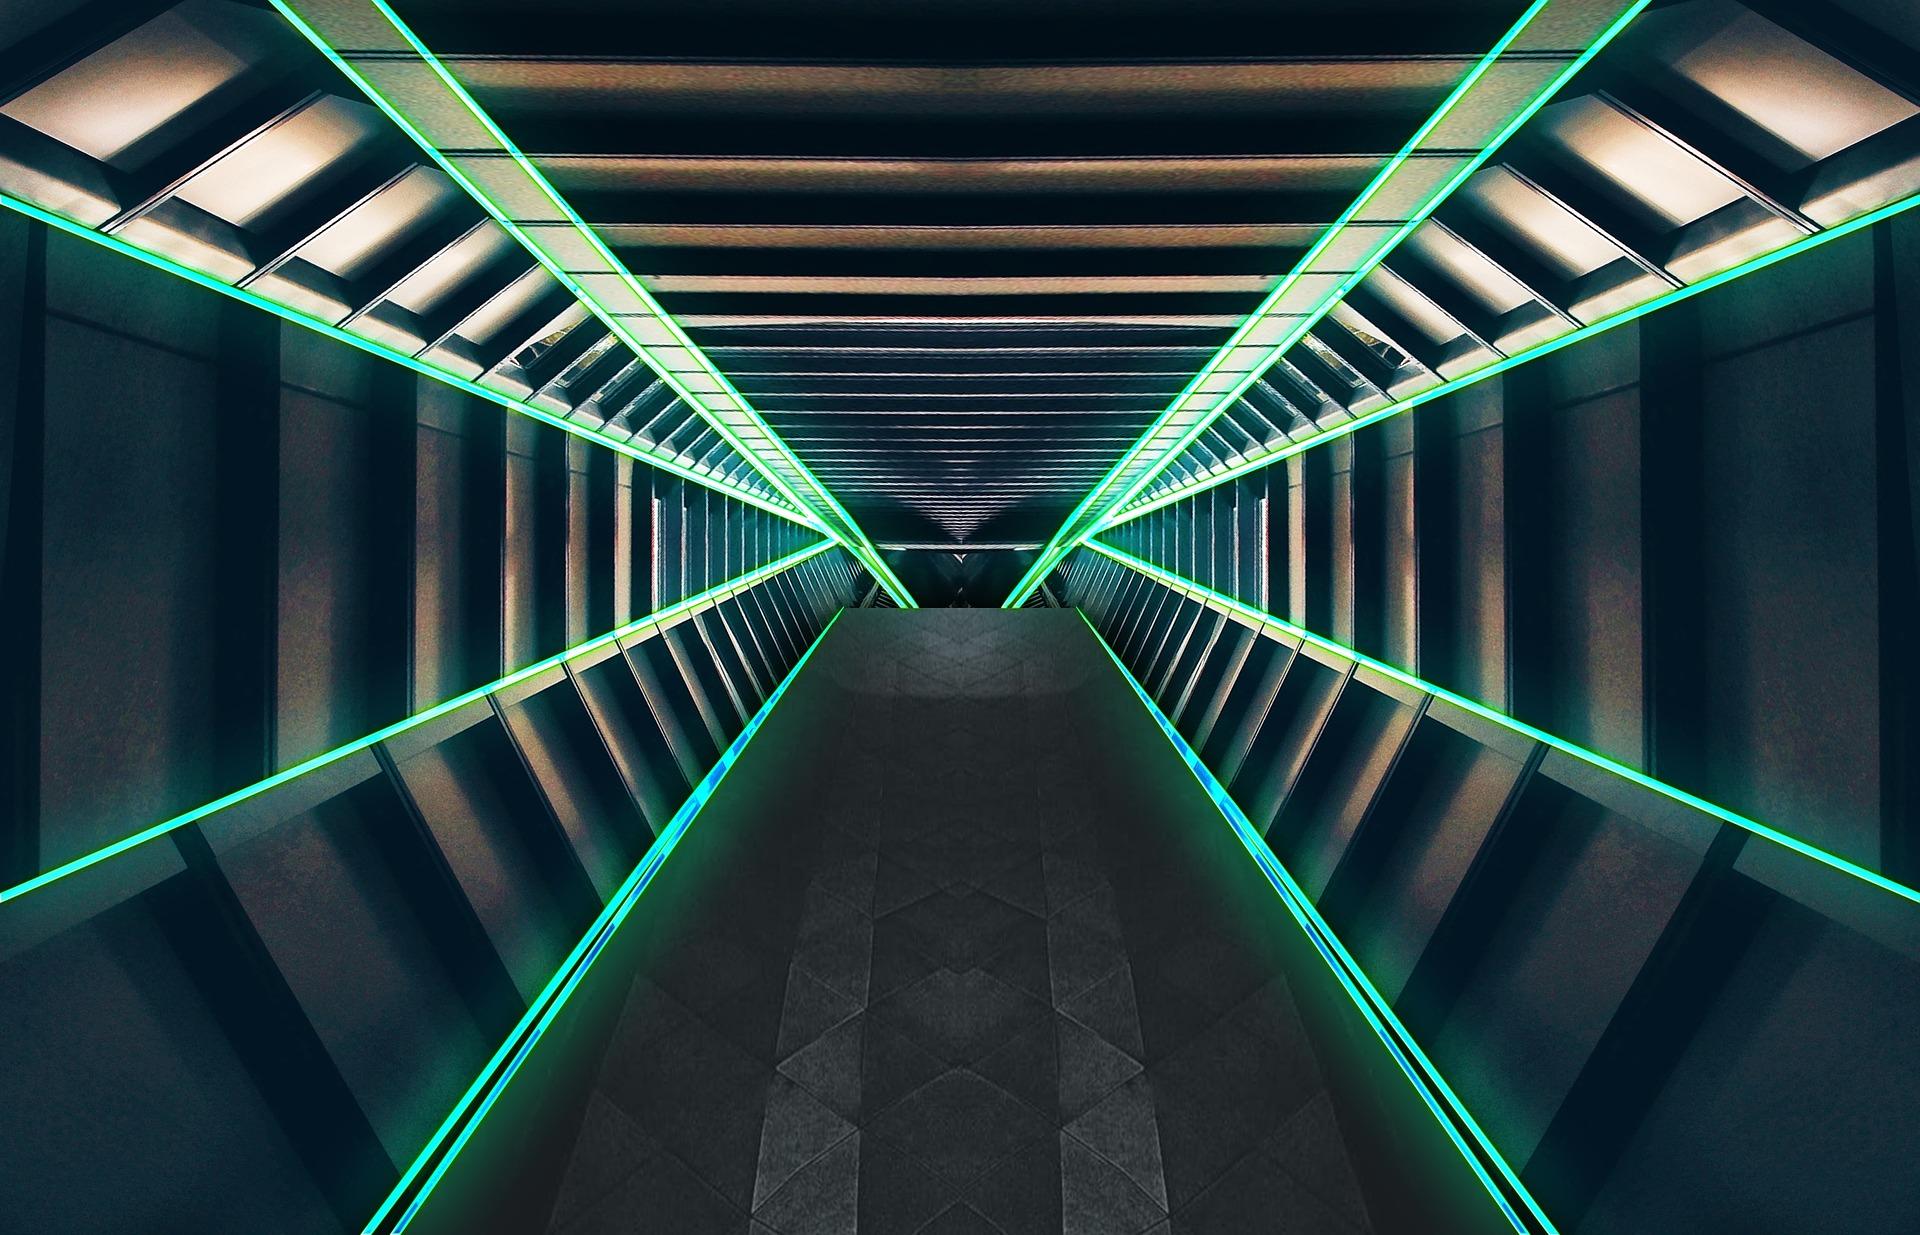 tunnel-3233082_1920.jpg